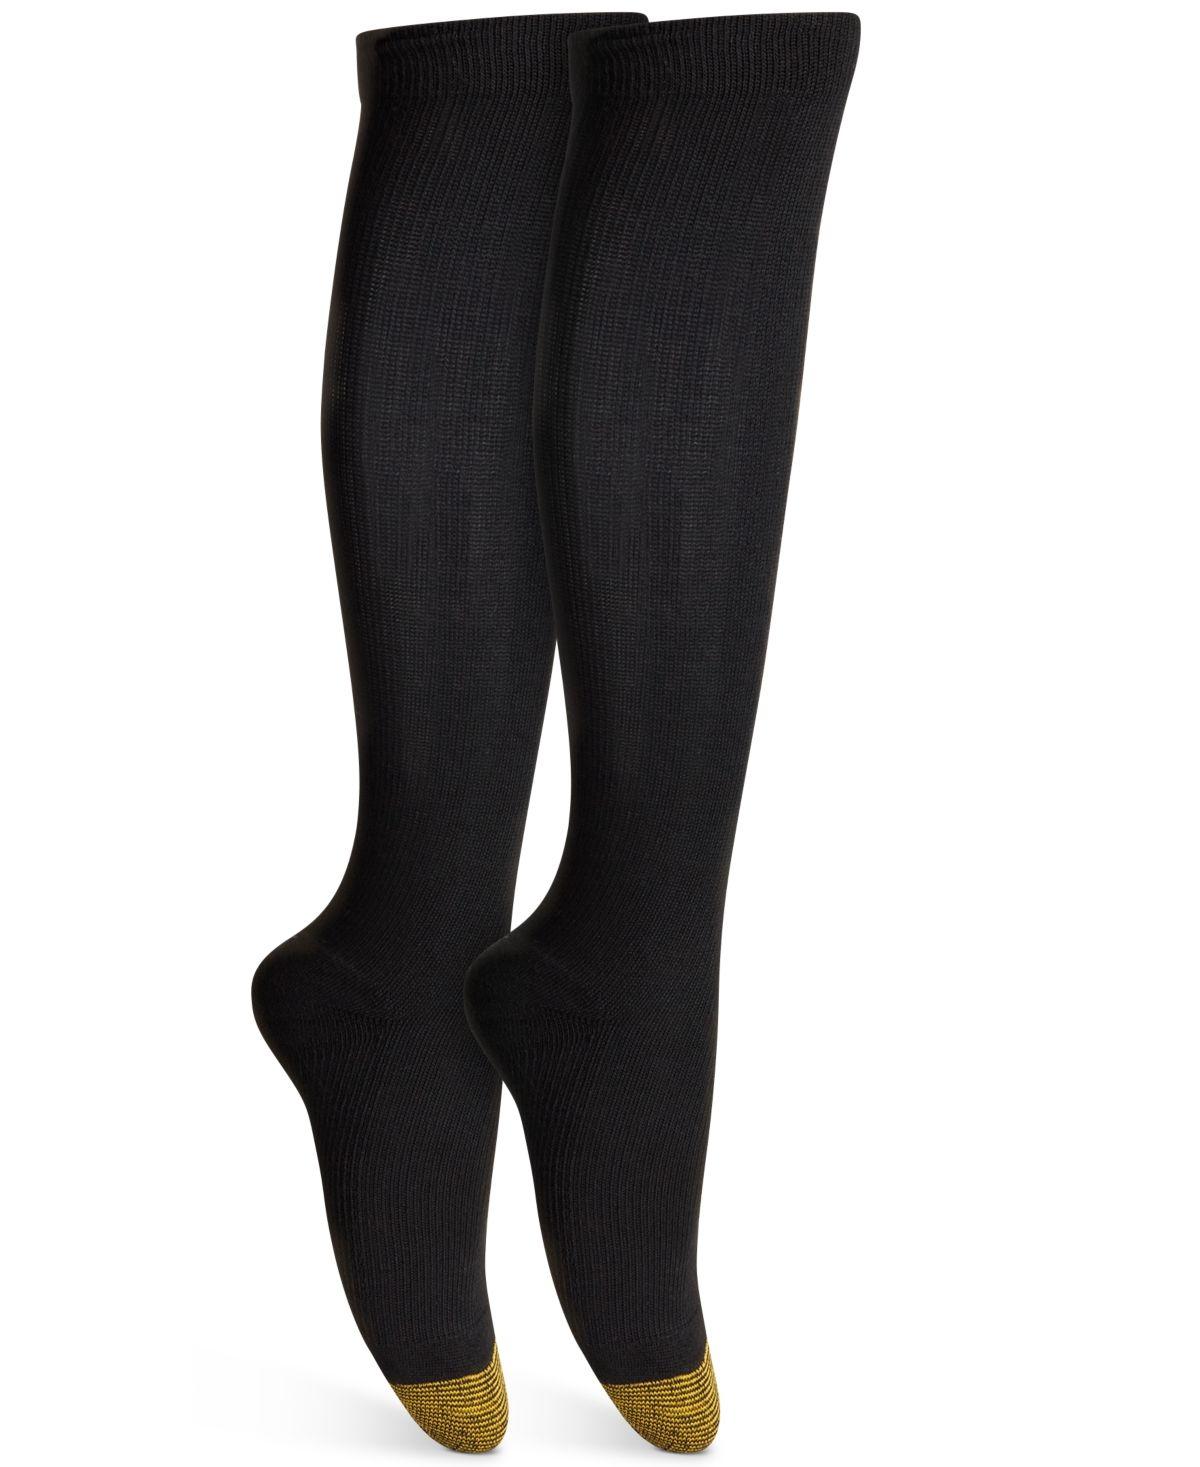 Gold toe womens coolmax compression socks black women